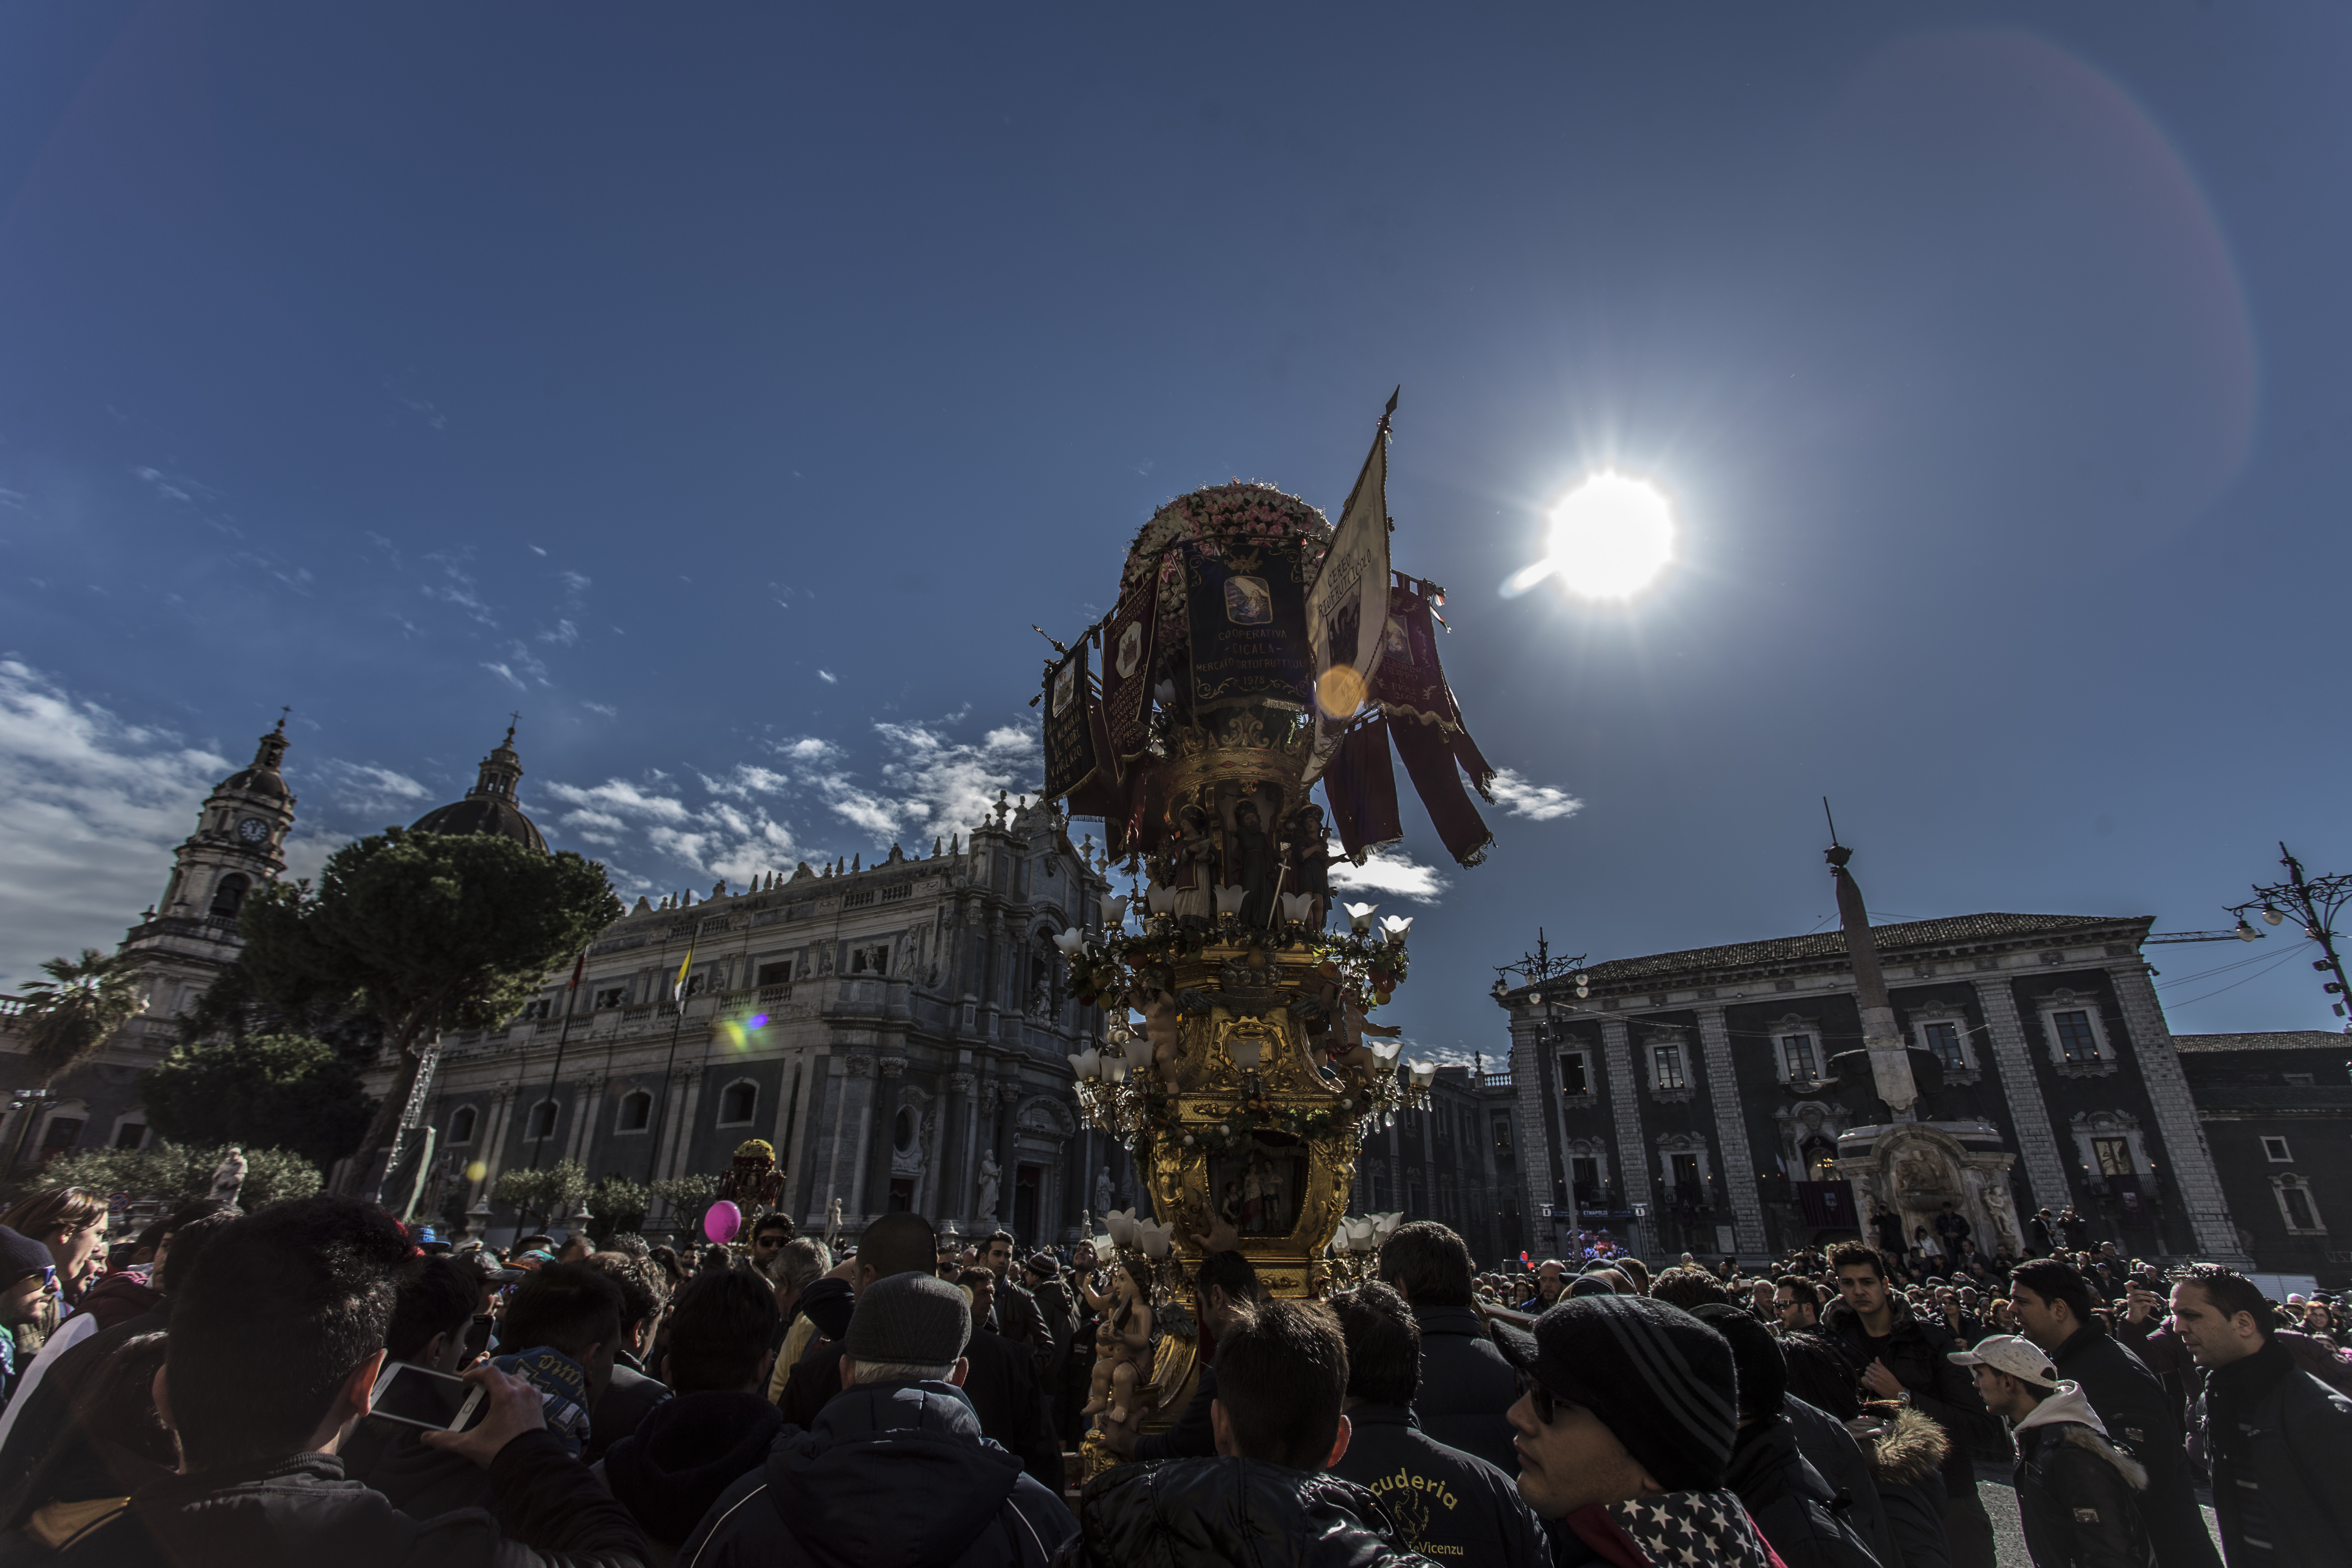 Candelora in piazza Duomo